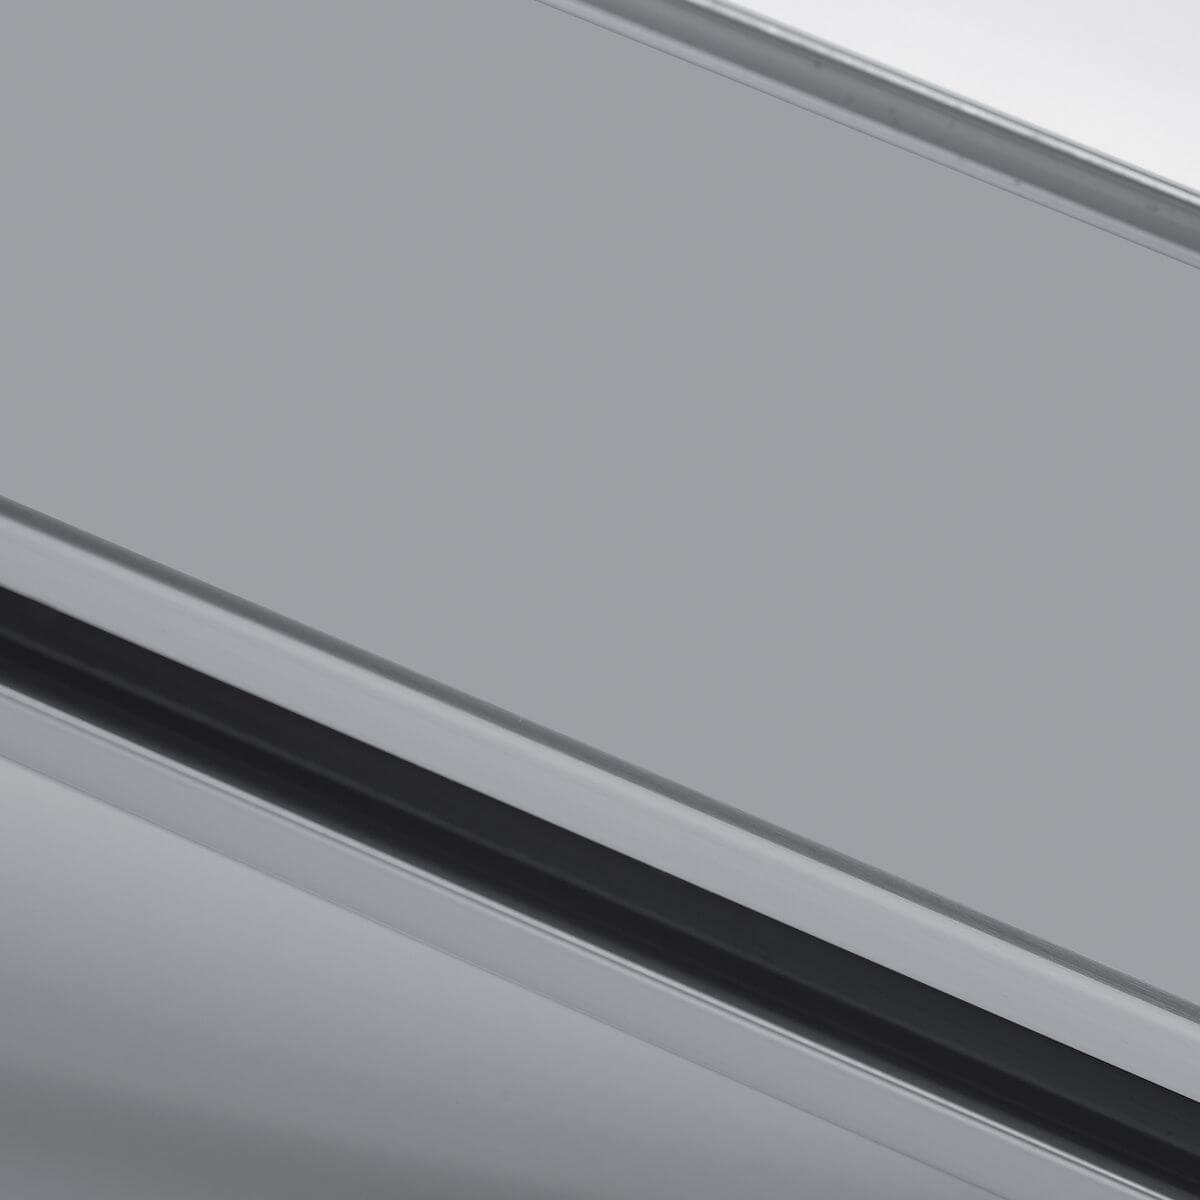 Finish aluminium grey ral 9006 for glass wall